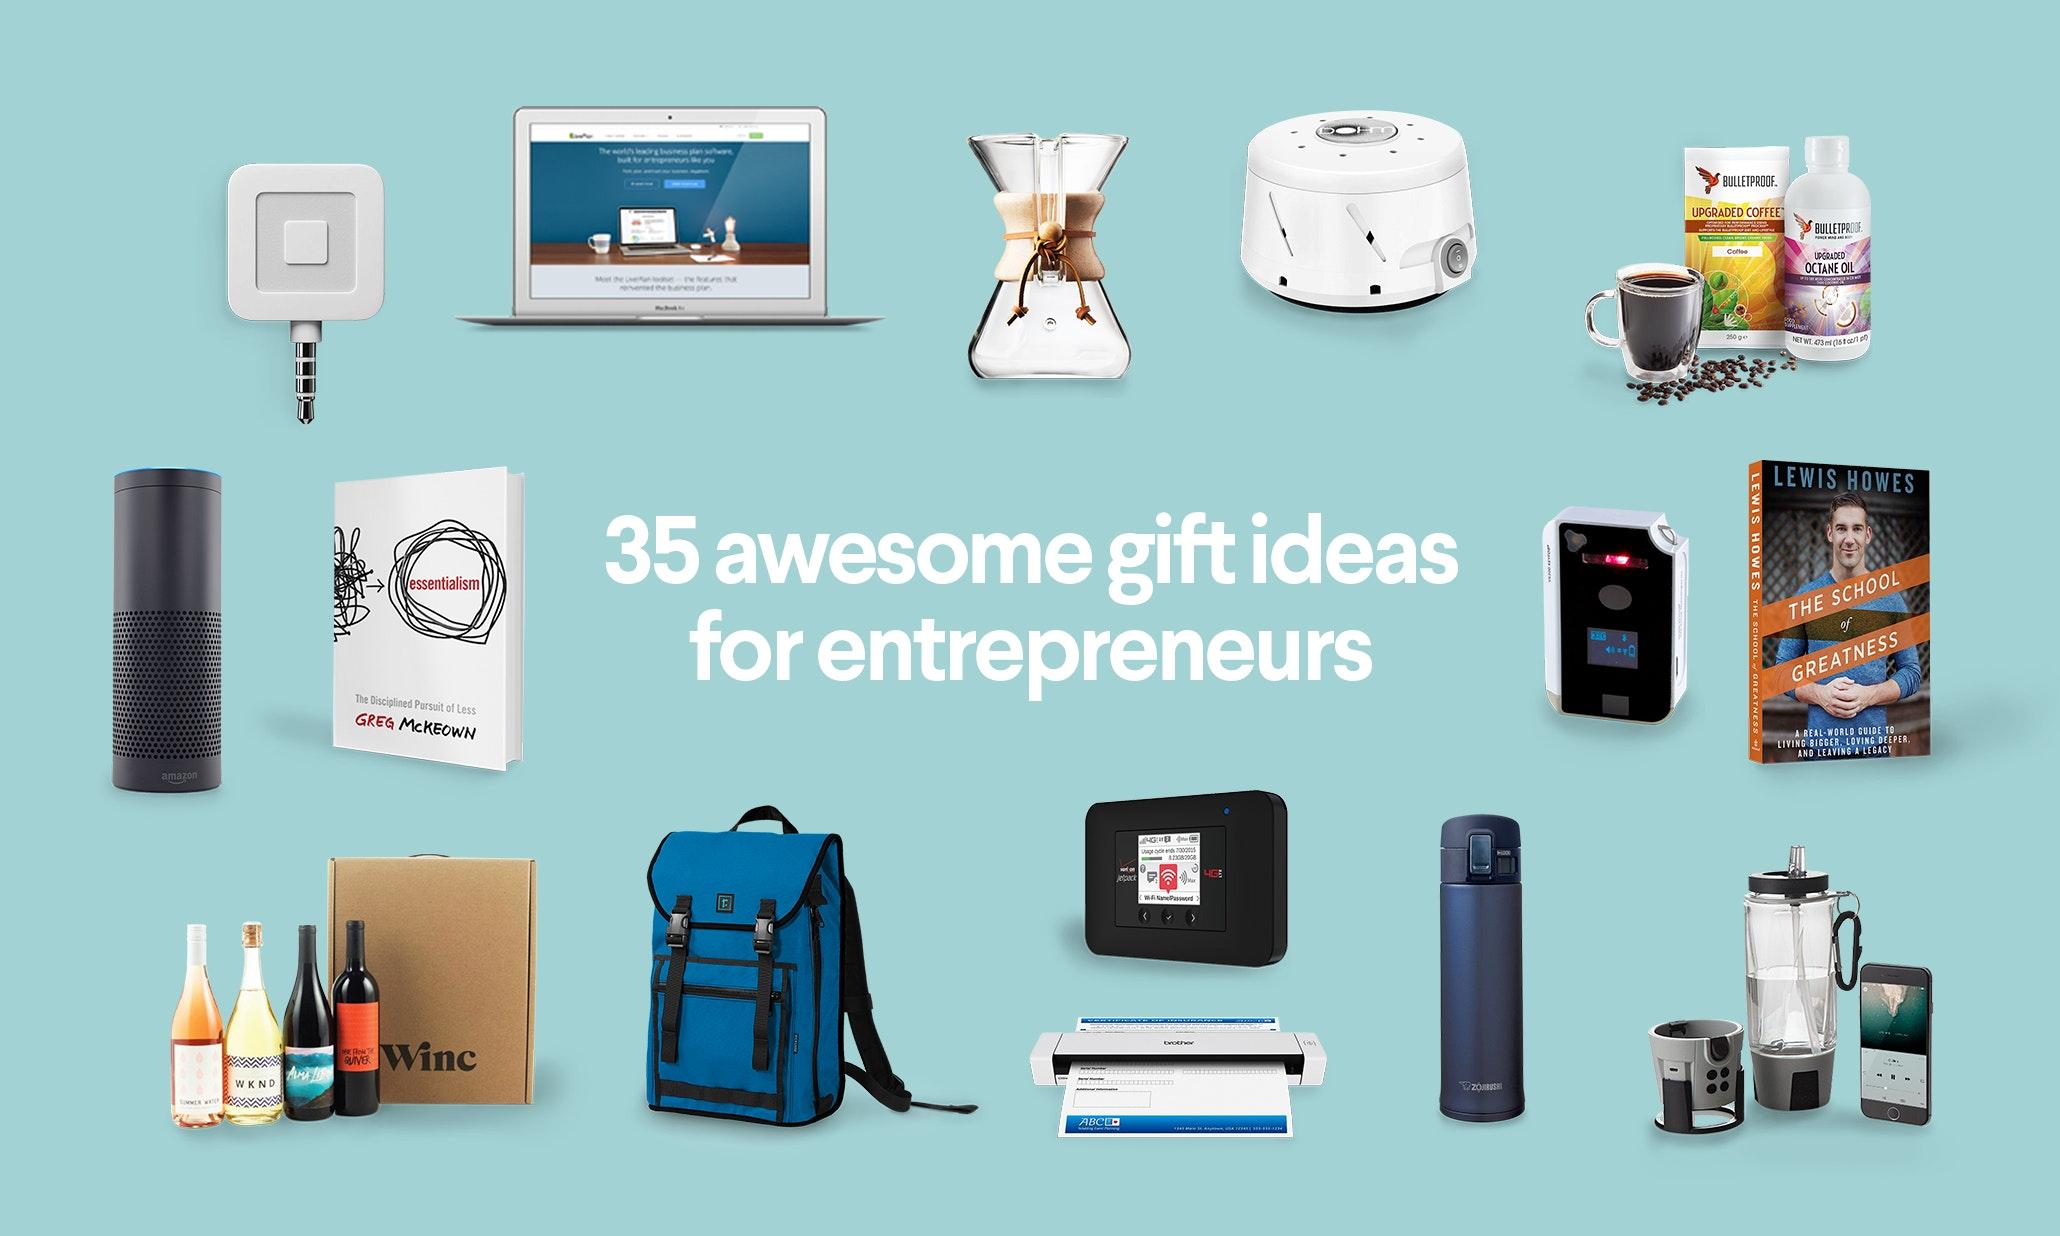 Guy Best Friend CND New Job  Promotion Entrepreneur Gift Idea For Him Funny Accomplishment Gift Starting A Business Men Gift